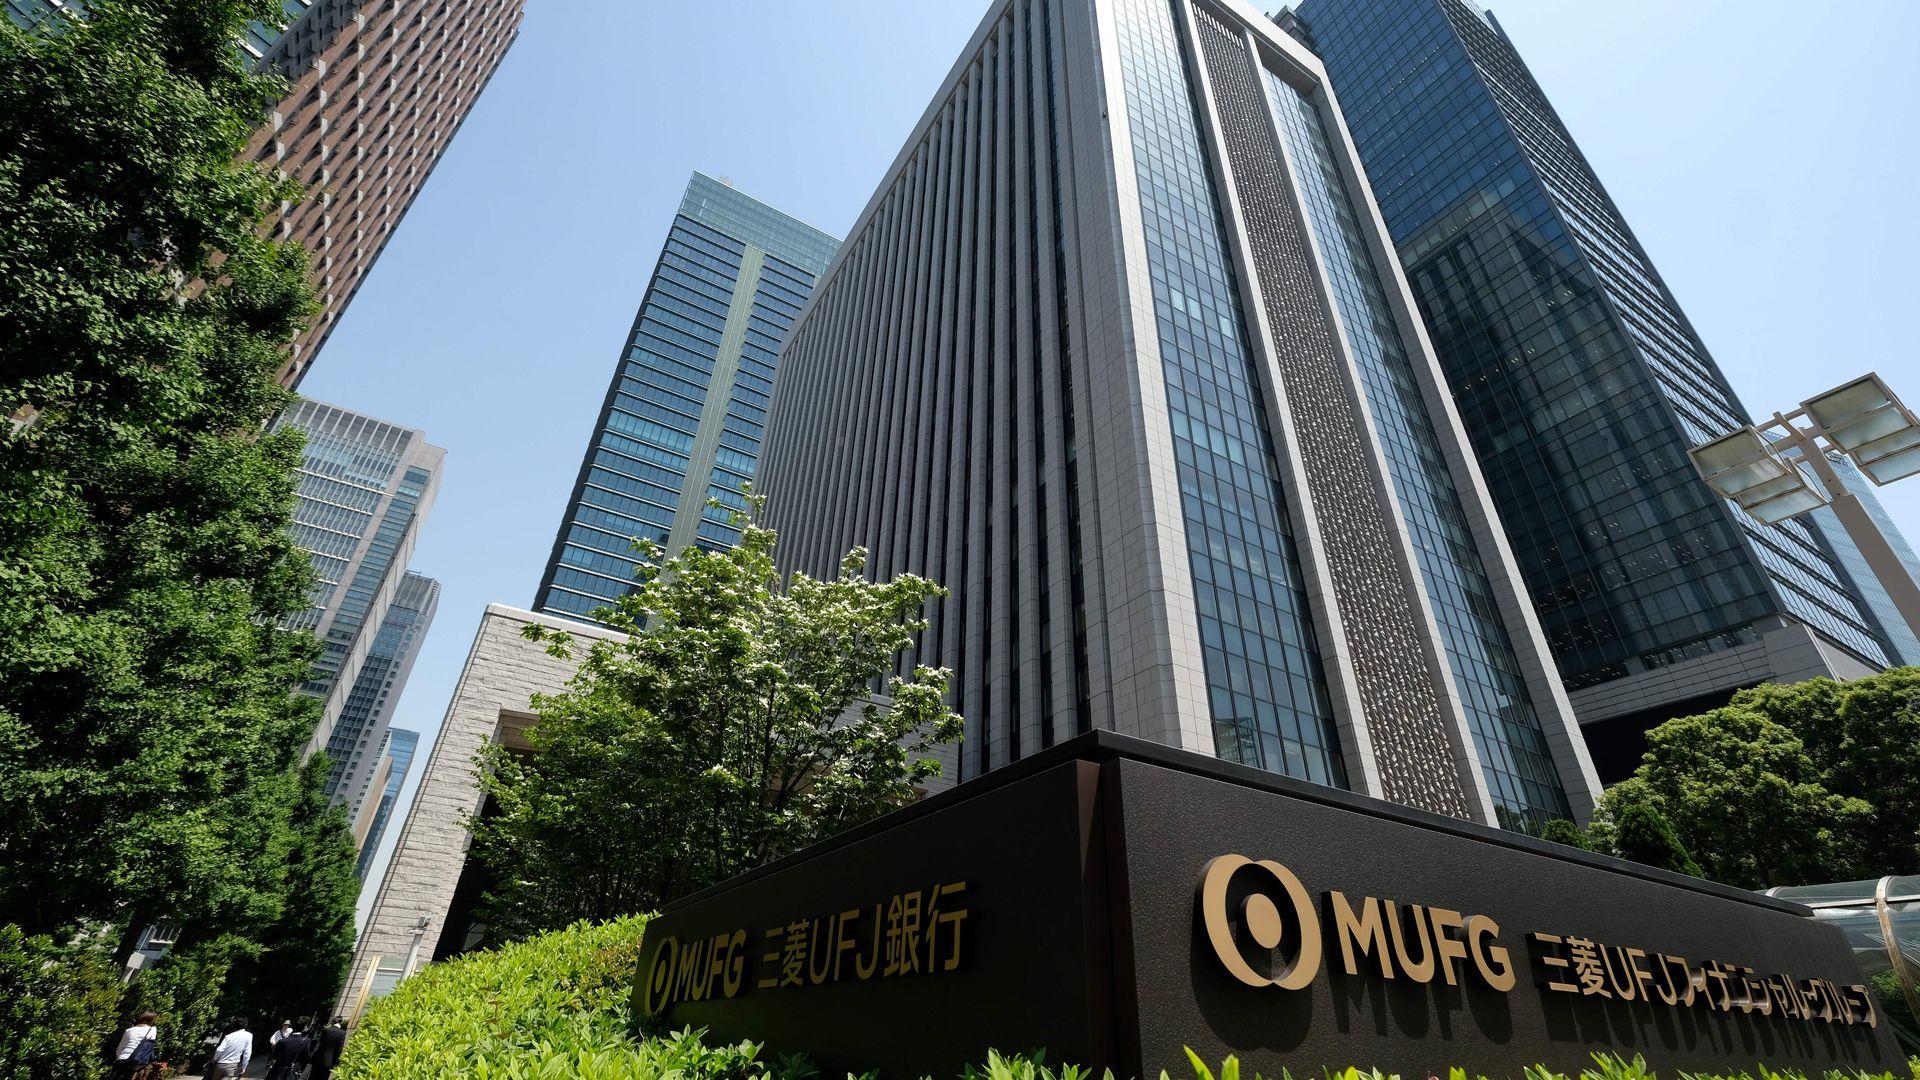 MUFG's office building in Tokyo